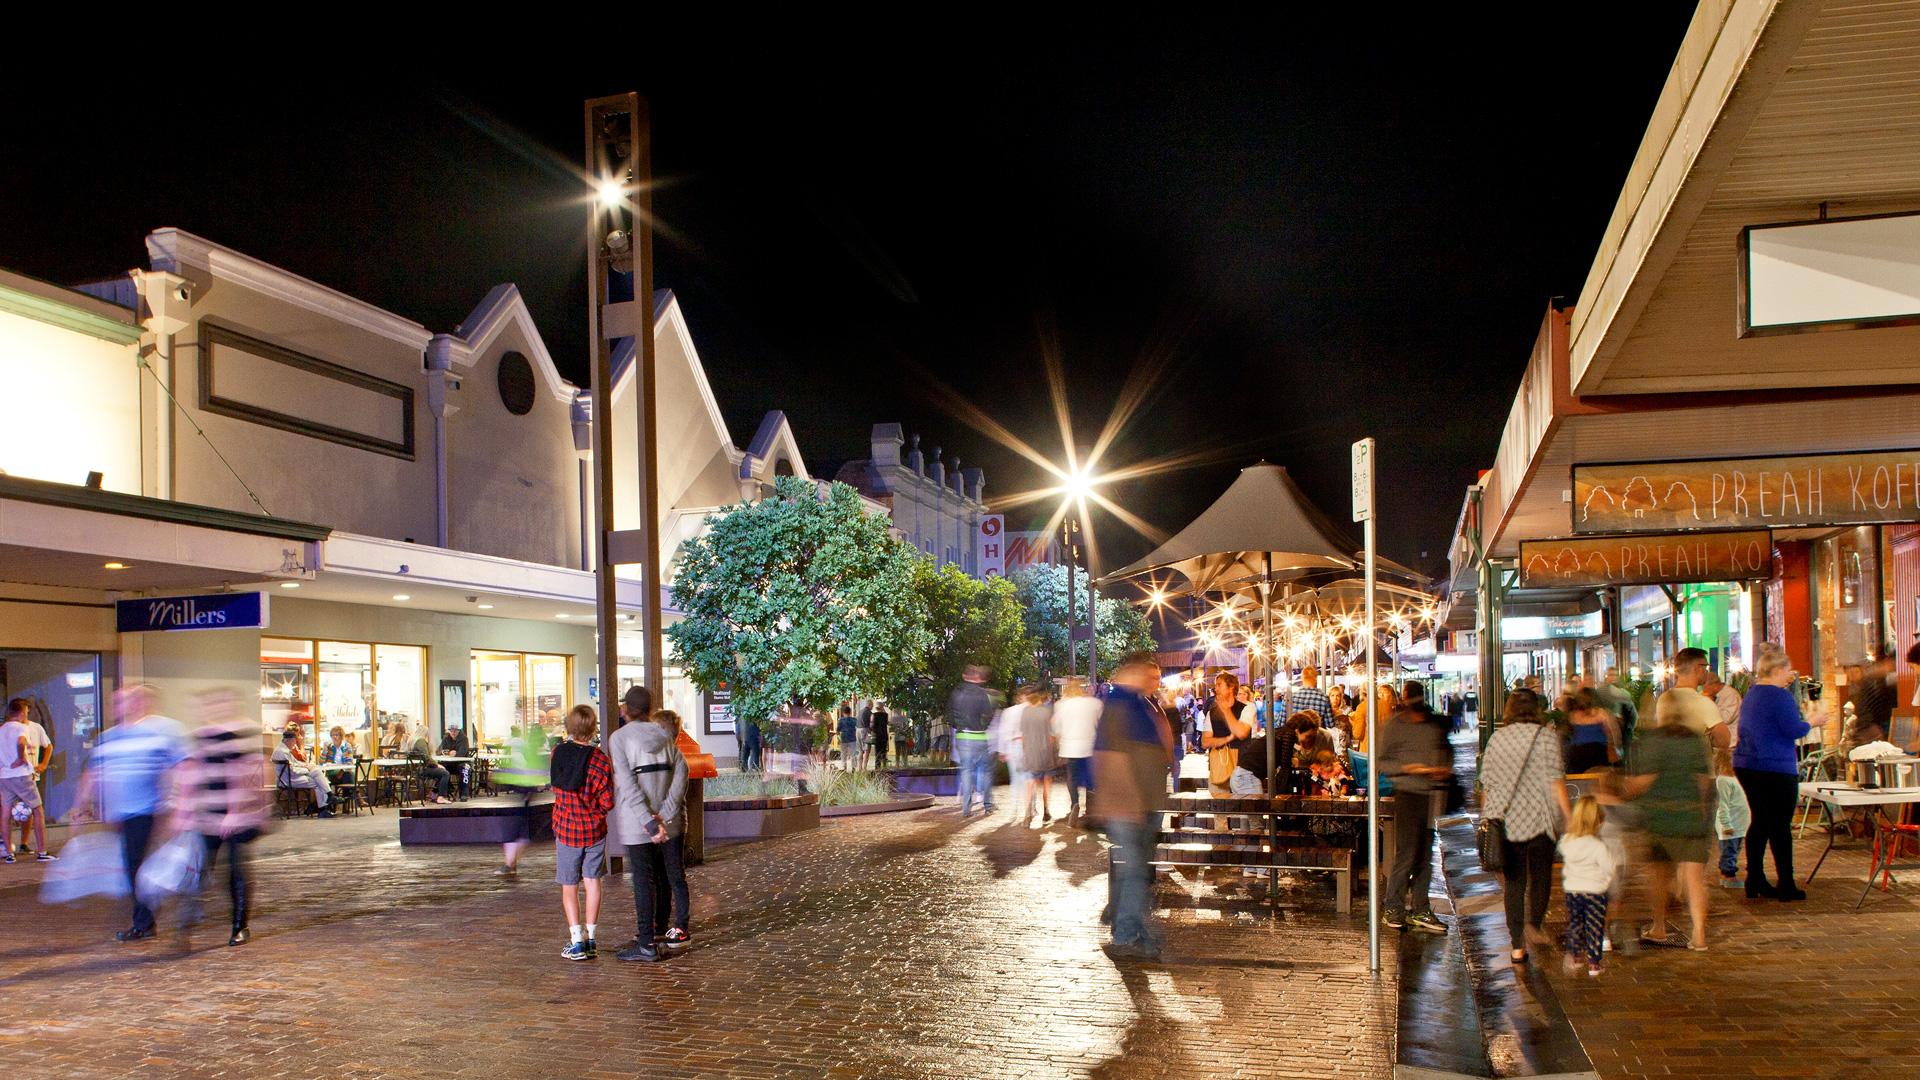 08.-MAITLAND-LEVEE-night-time-event-pillar-lights-and-shelter-lights-pedestrians-only_Simon-Wood.jpg